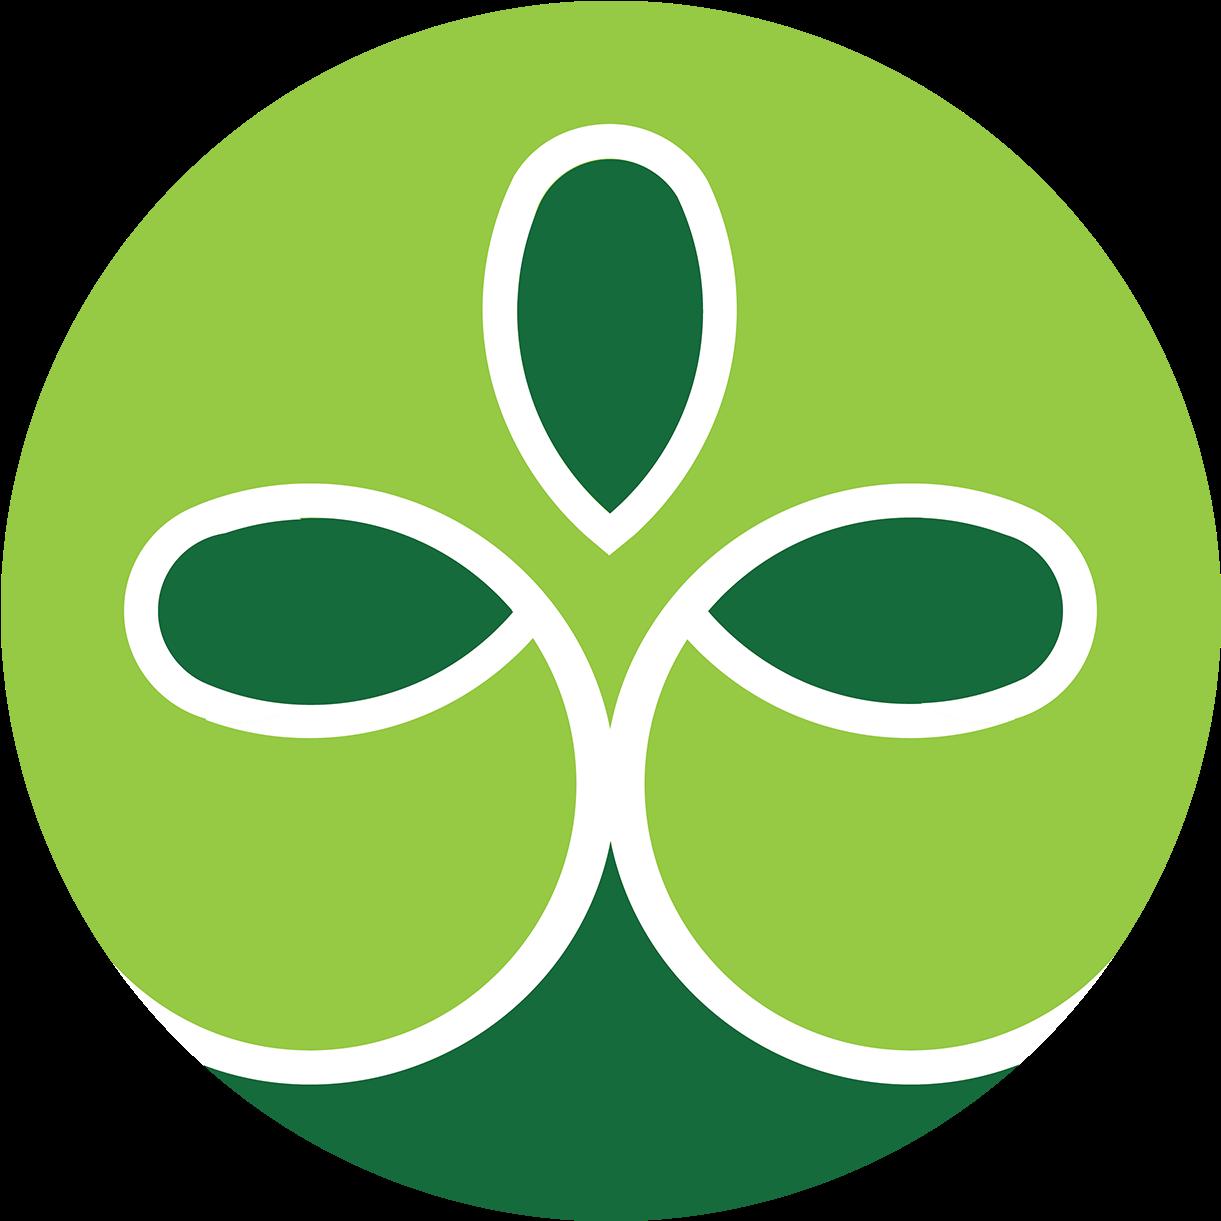 Oxfam Clipart.